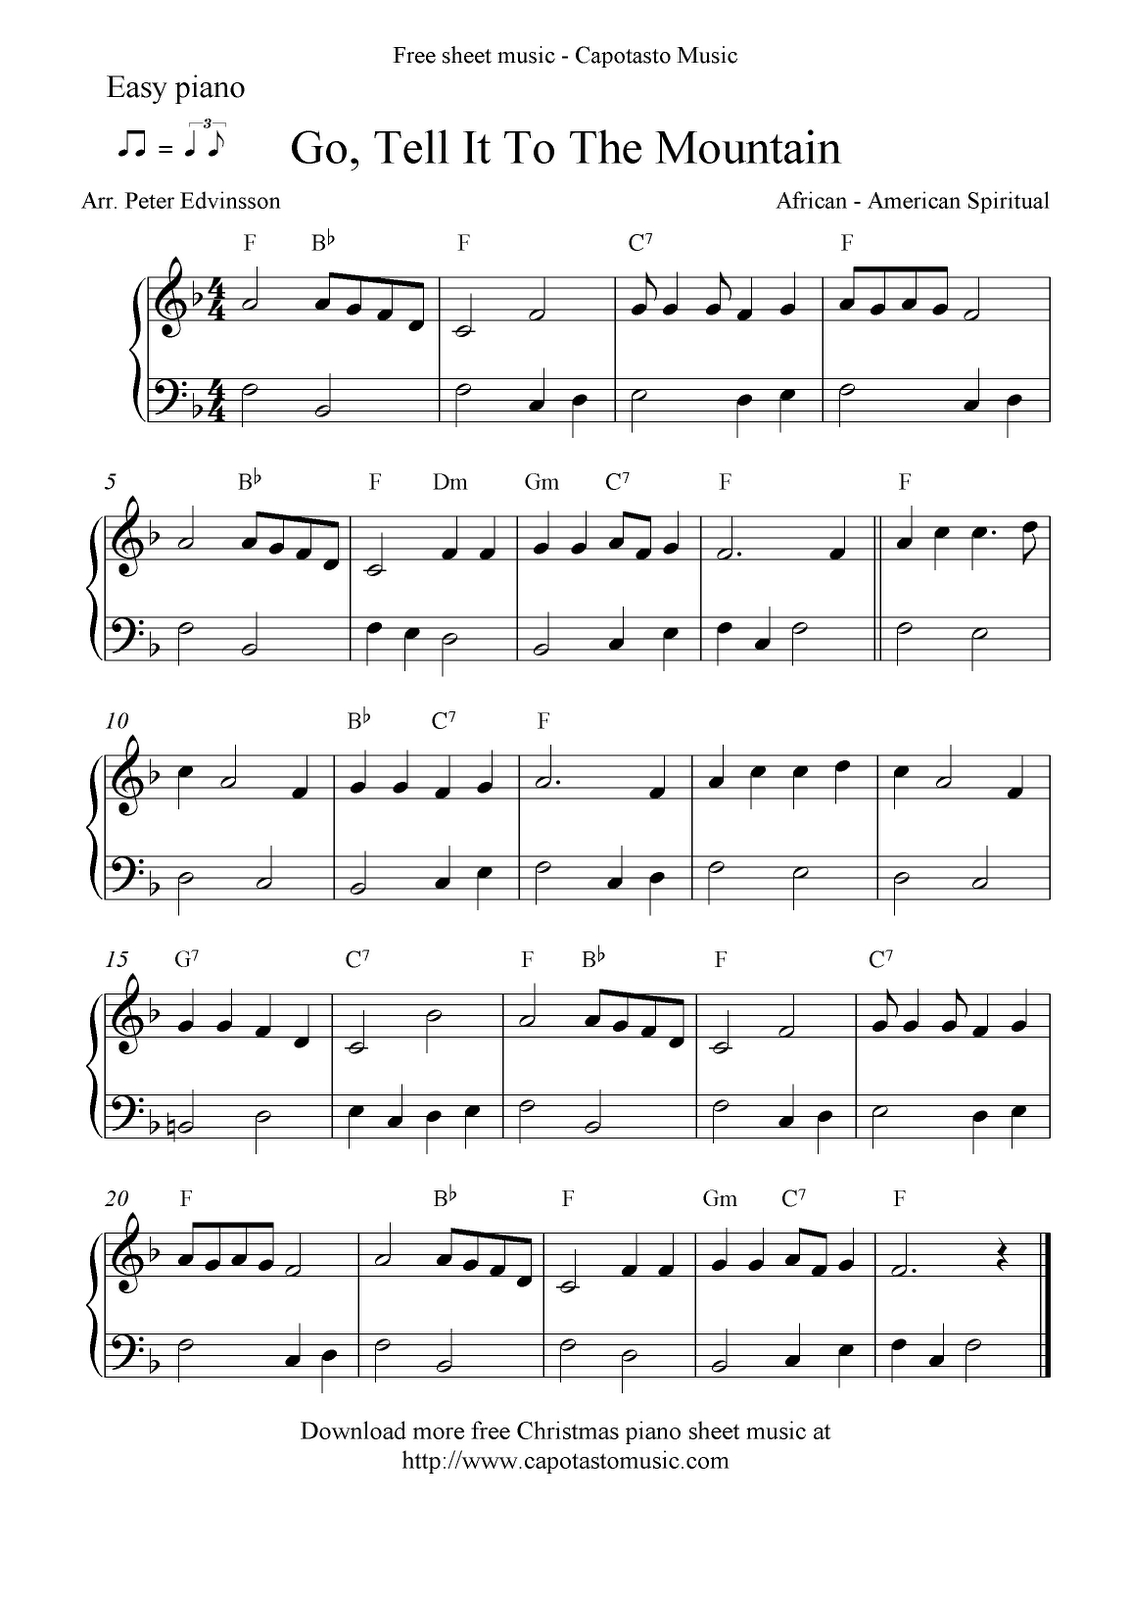 Pinterest - Free Christmas Sheet Music For Keyboard Printable